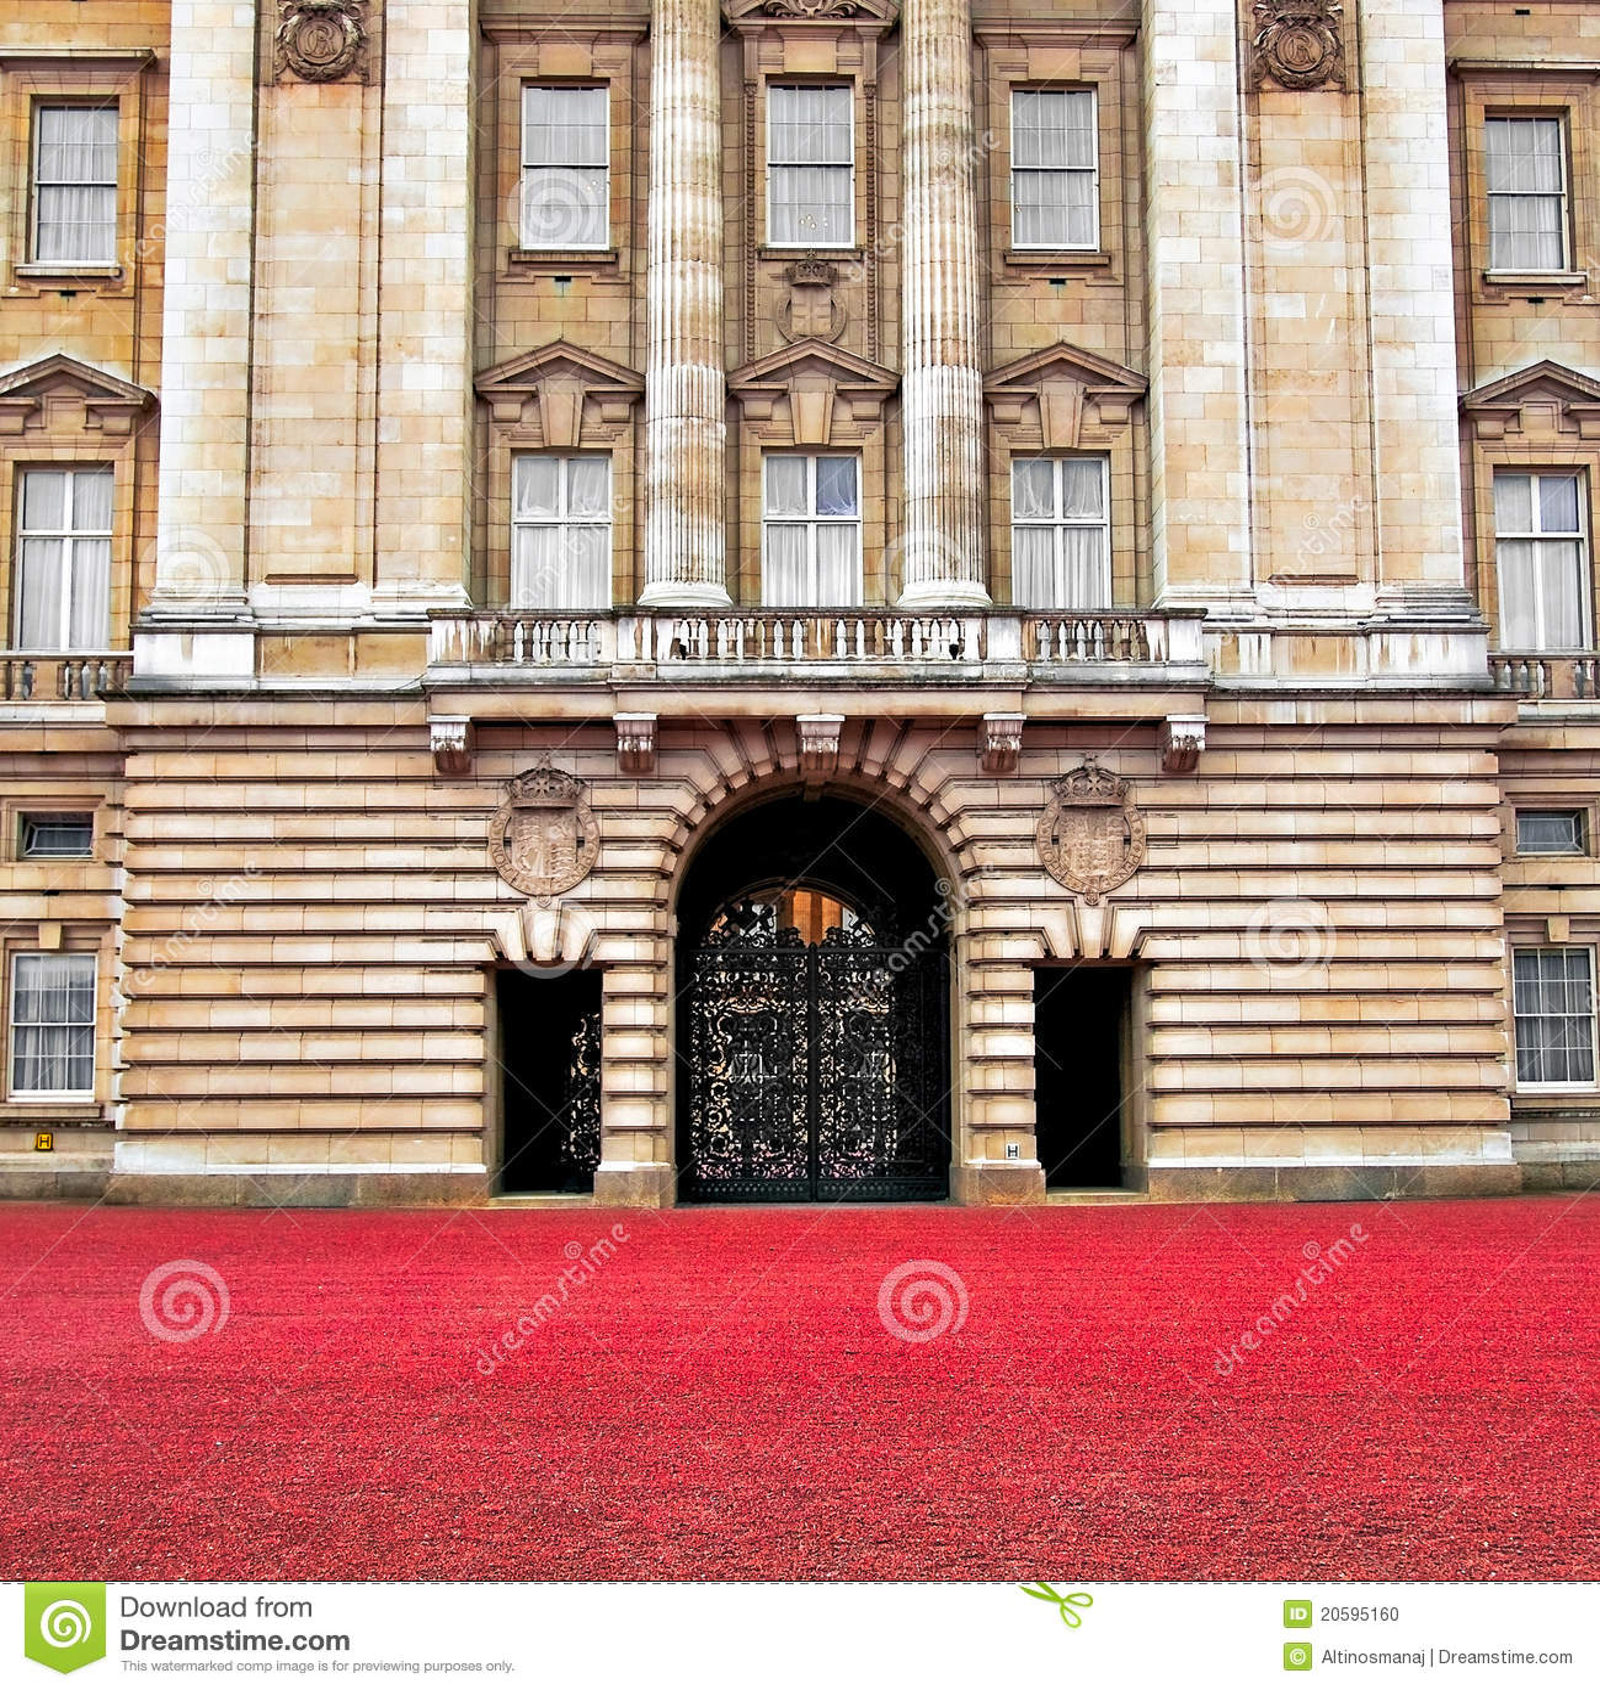 Buckingham palace front gate london editorial image - Buckingham palace interno ...